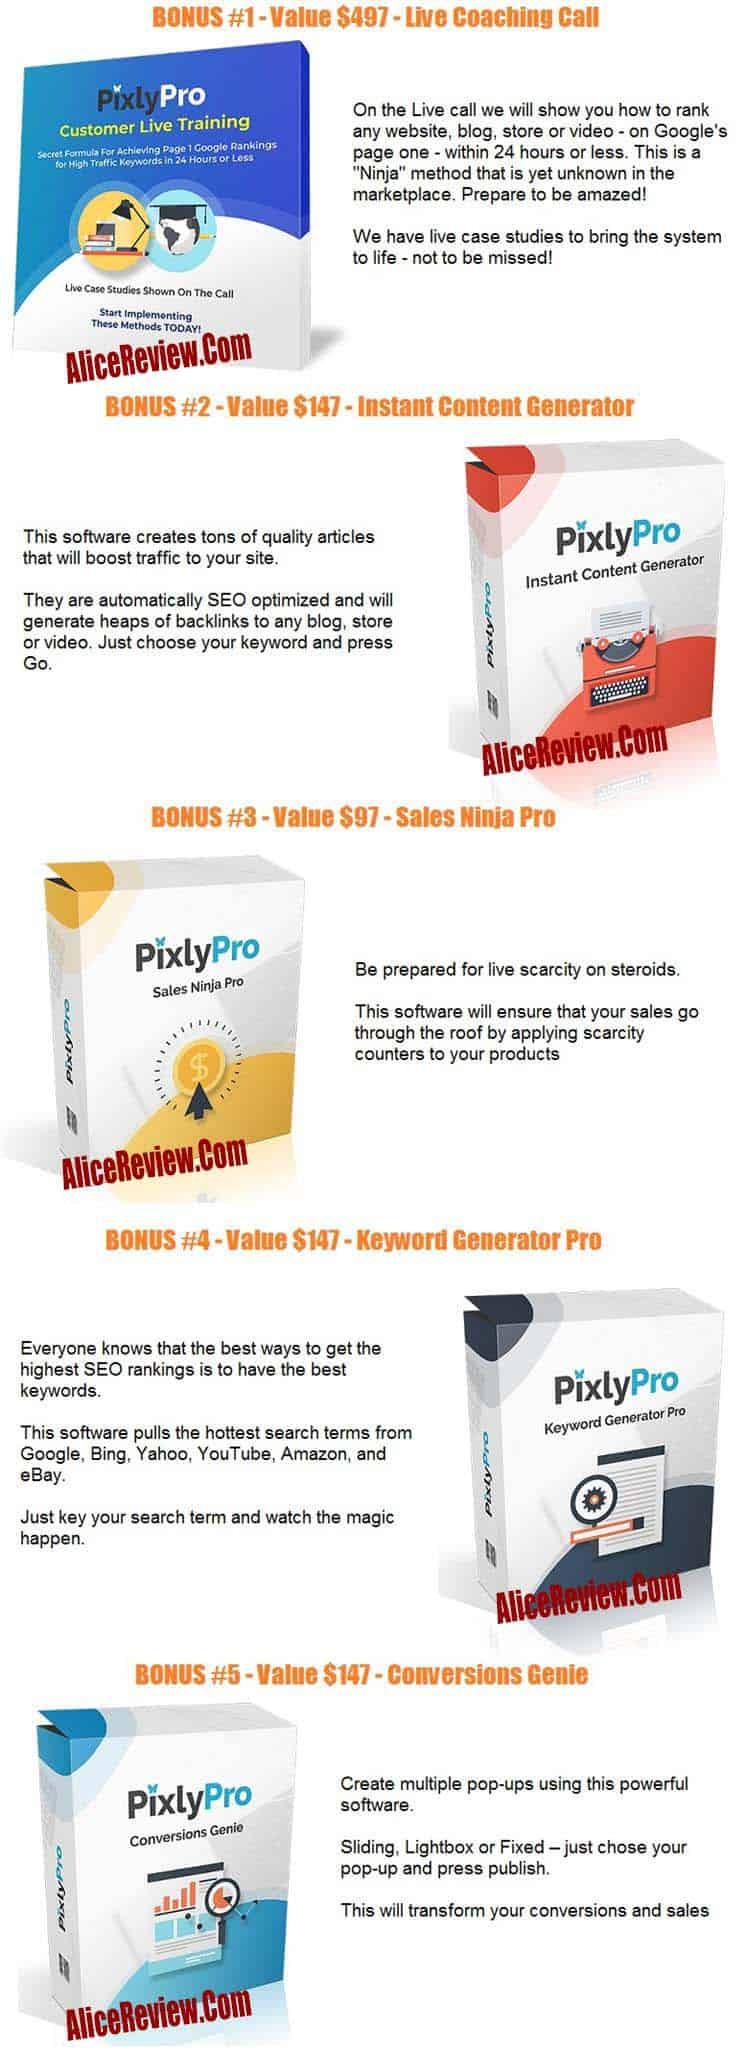 PixlyPro Bonus